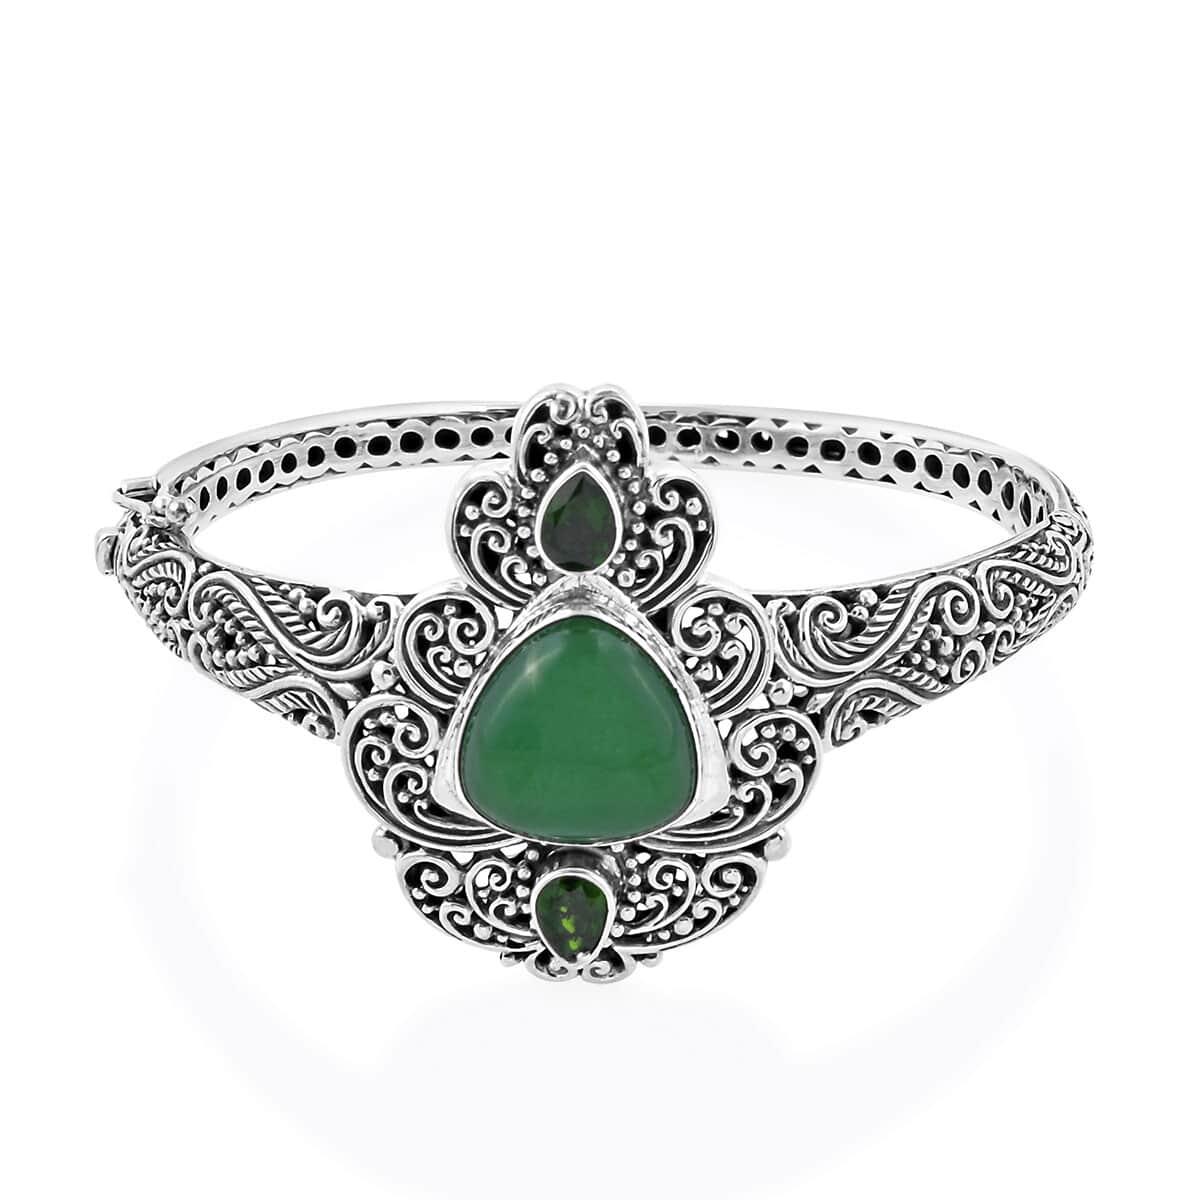 Bali Legacy Burmese Green Jade, Russian Diopside Bangle Bracelet (7.50 in) in Sterling Silver 15.80 ctw